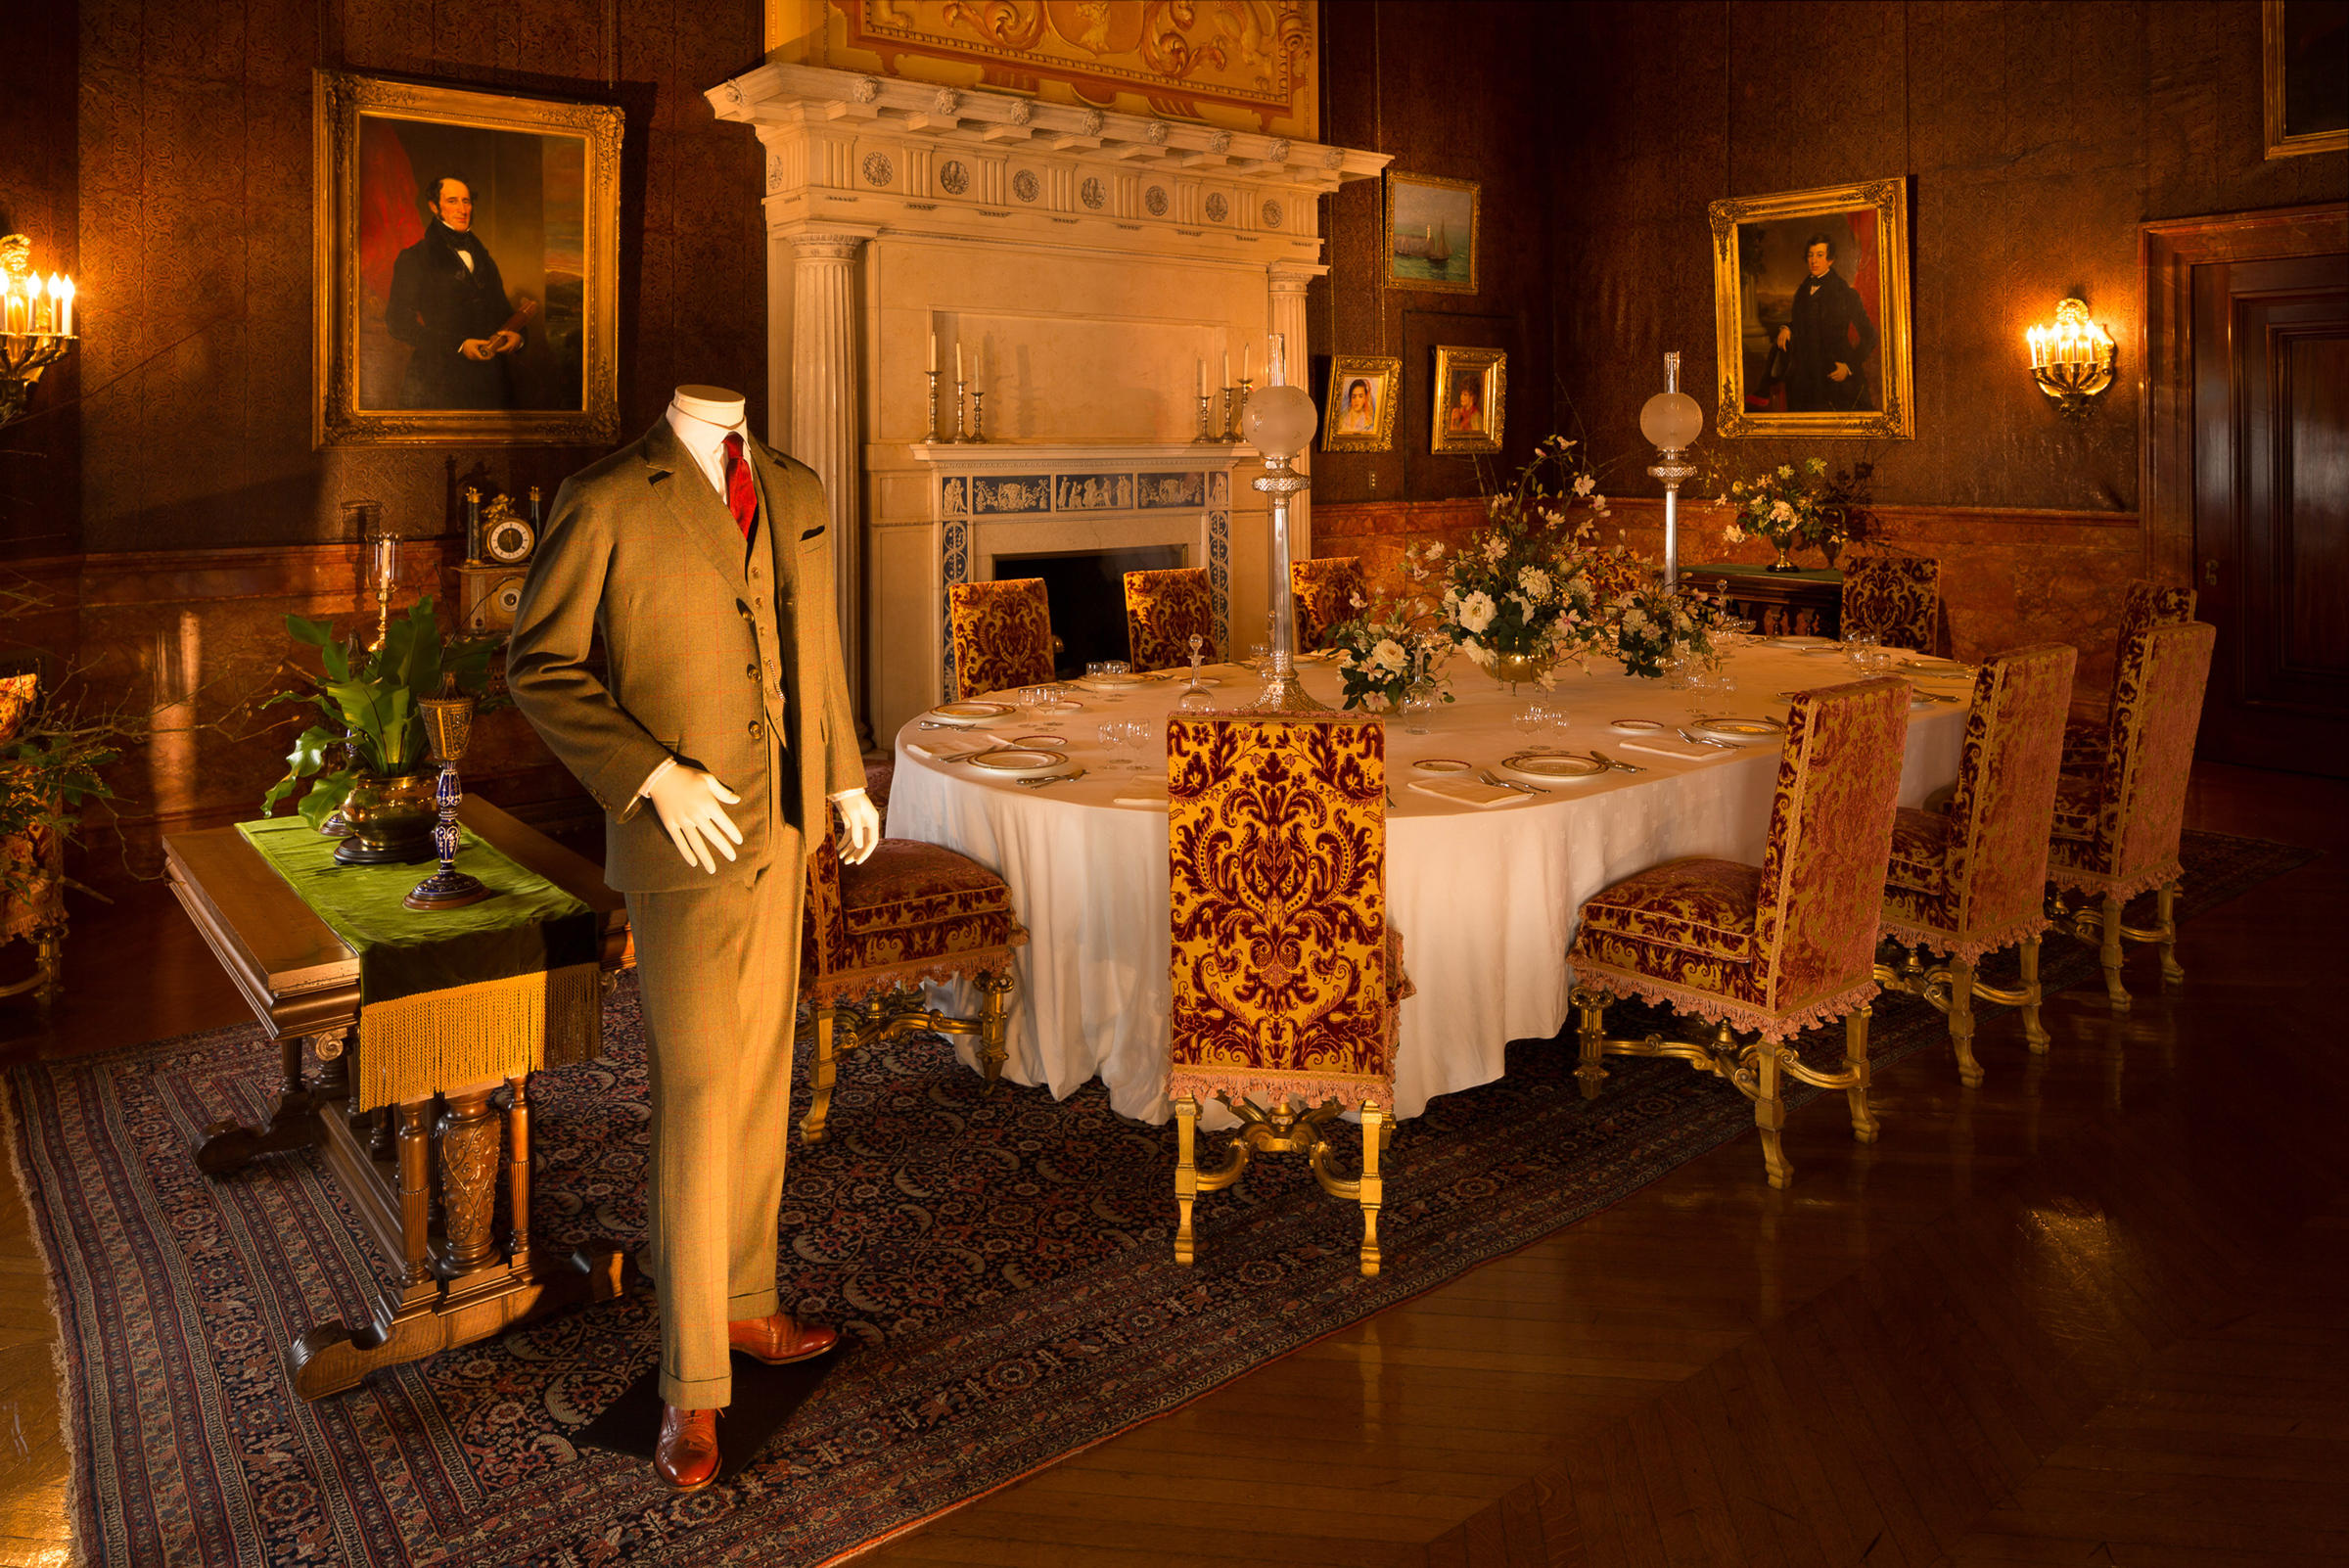 in the breakfast room is matthew crawley gentlemans attire wool with long pants worn view slideshow 6 of 7